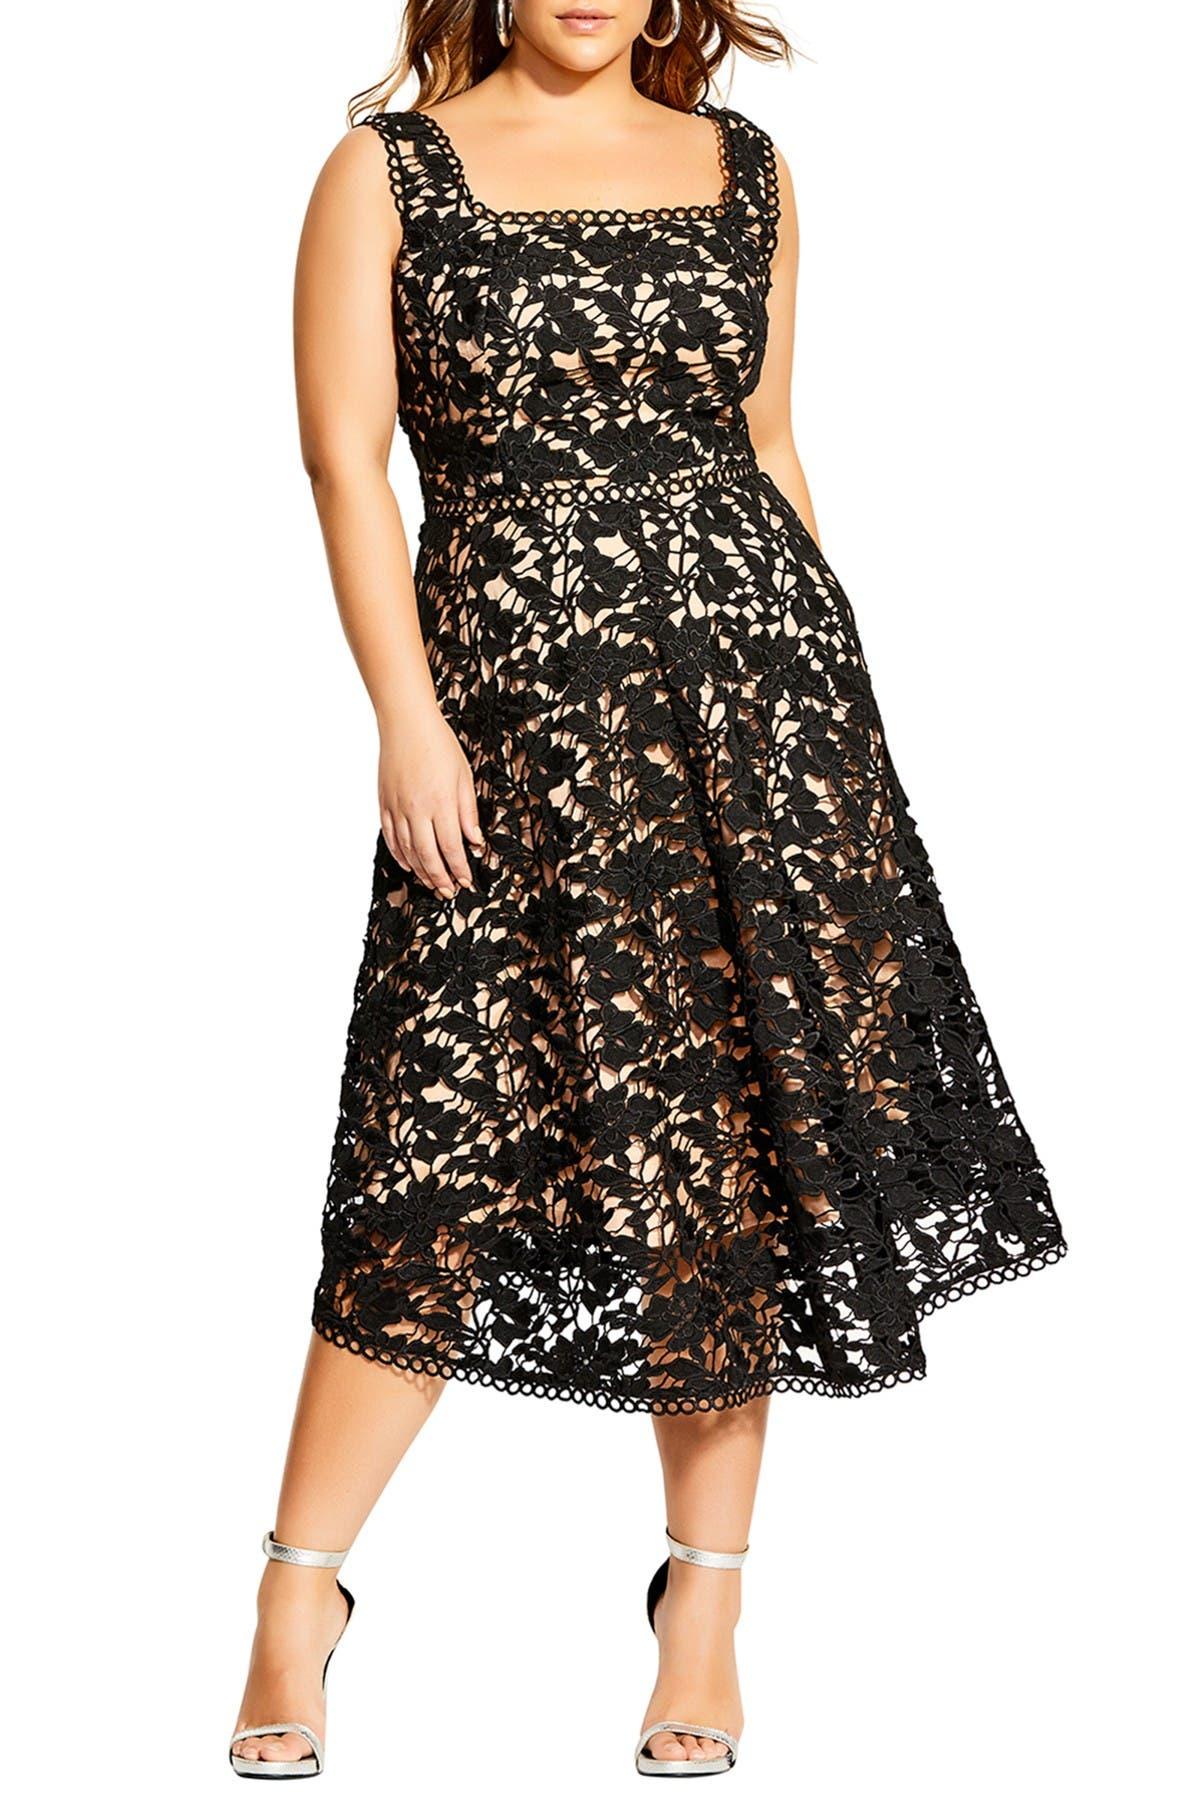 Image of City Chic Lace Avery Dress